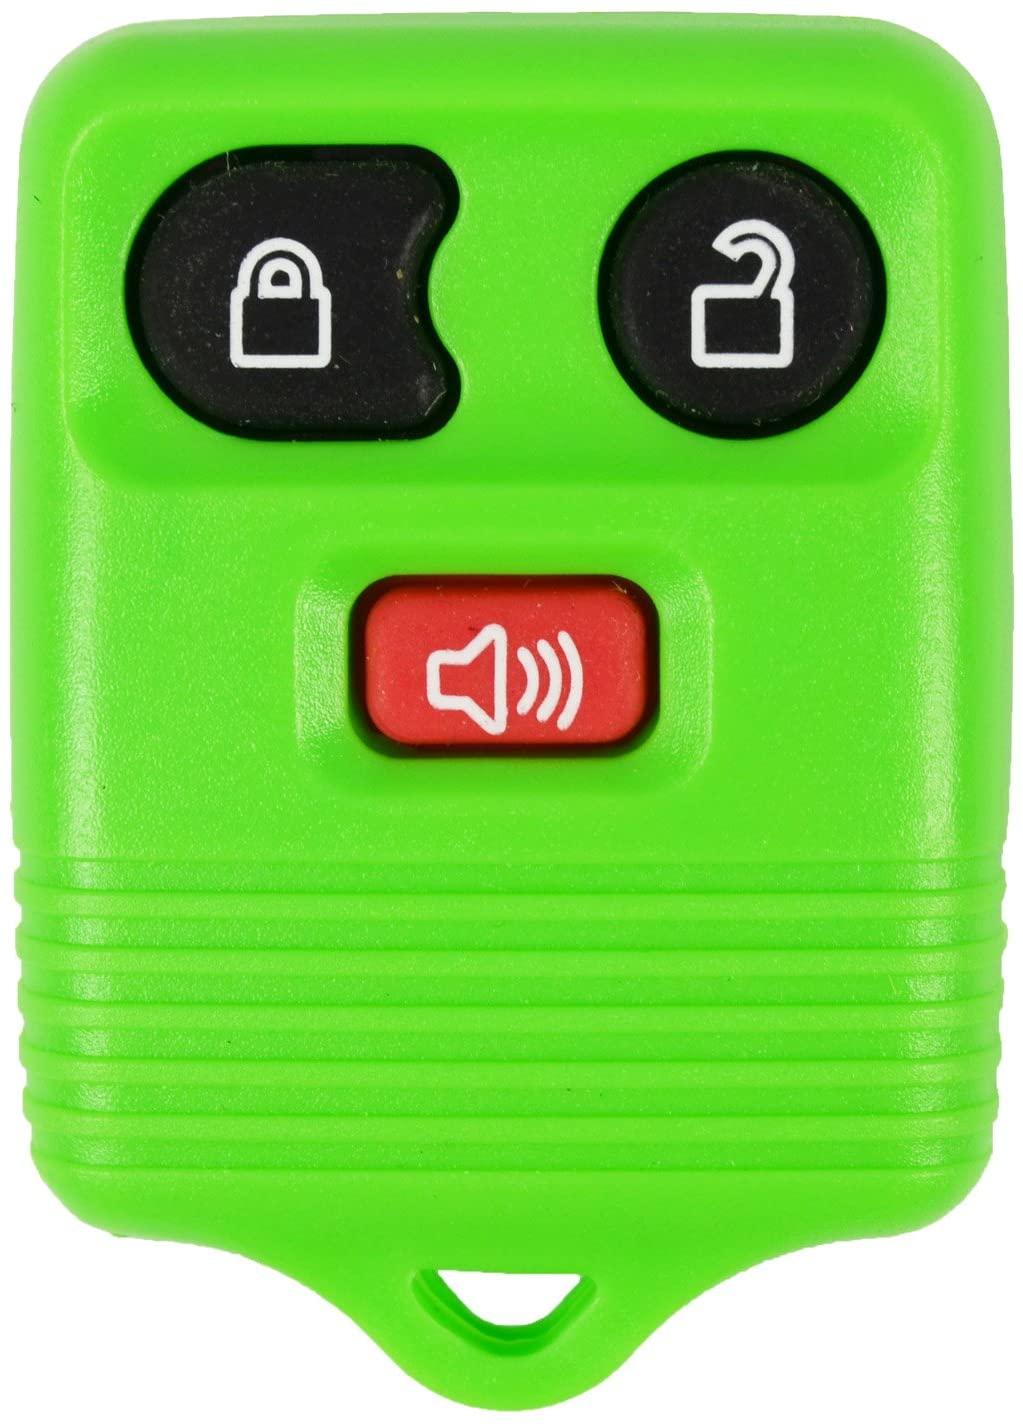 qualitykeylessplus Green Remote Replacement 3 Button Keyless Entry FCC ID: CWTWB1U331 Free KEYTAG